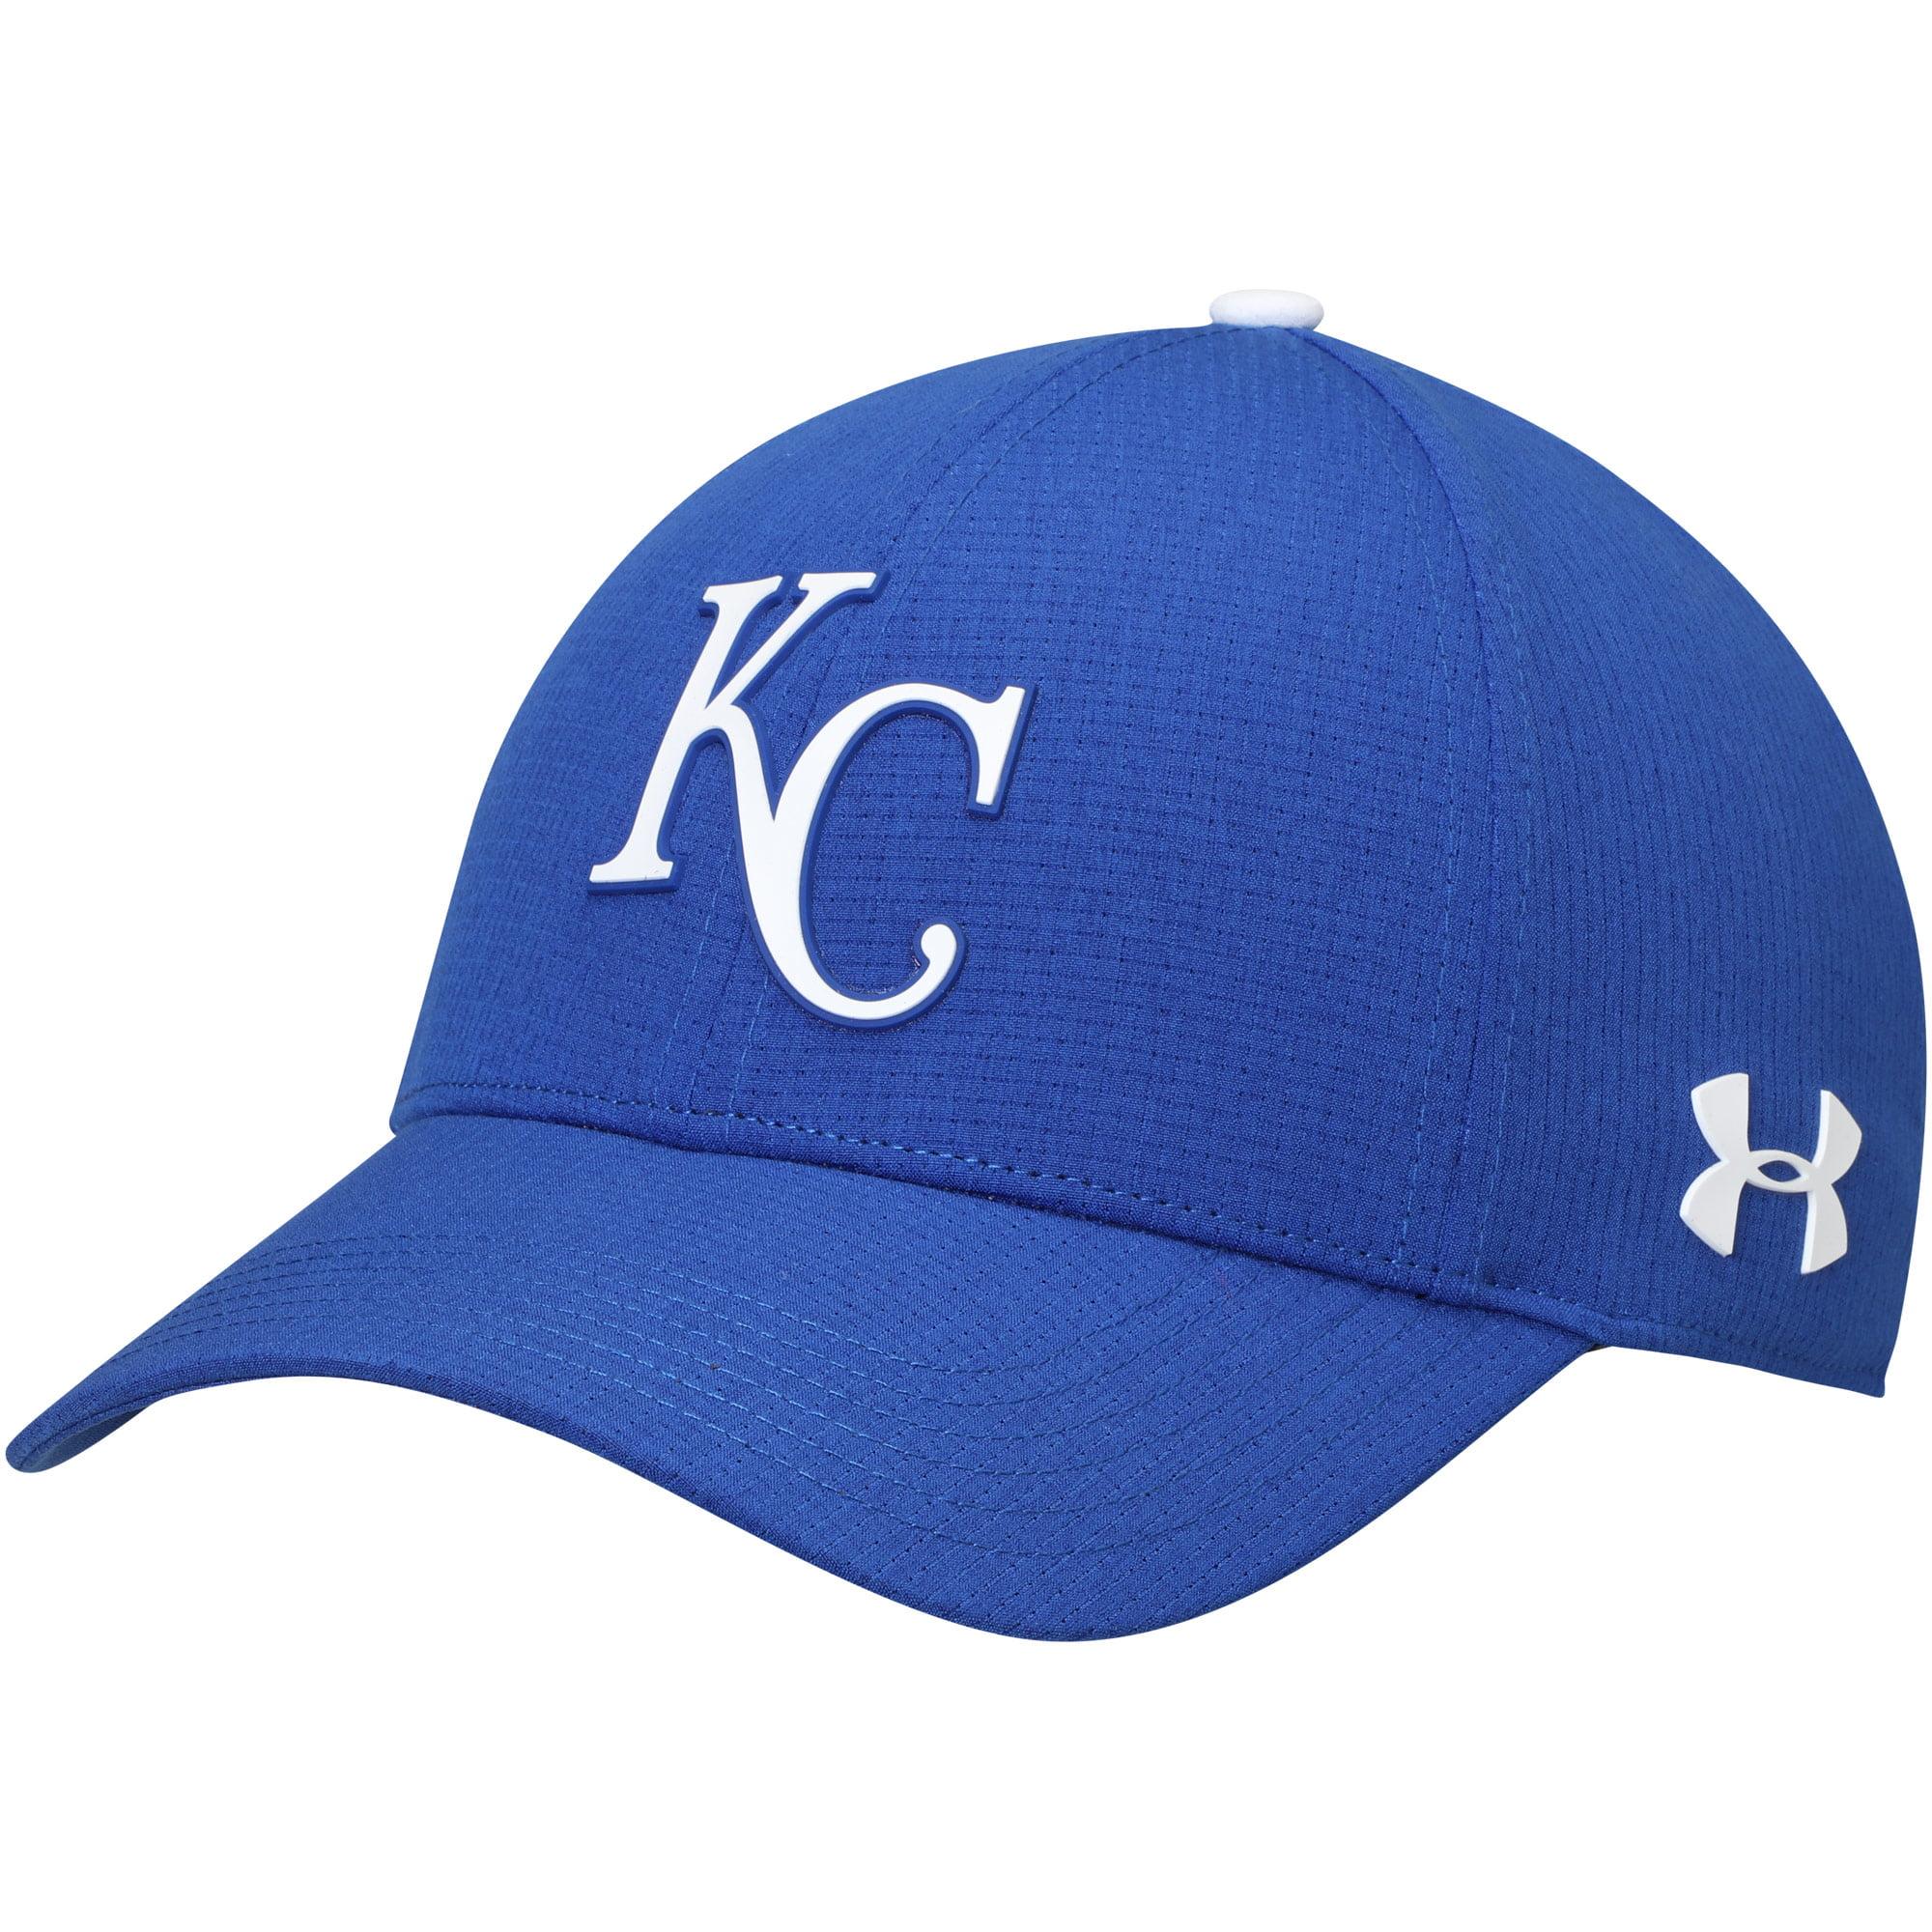 Kansas City Royals Under Armour MLB Driver Cap 2.0 Adjustable Hat - Royal - OSFA